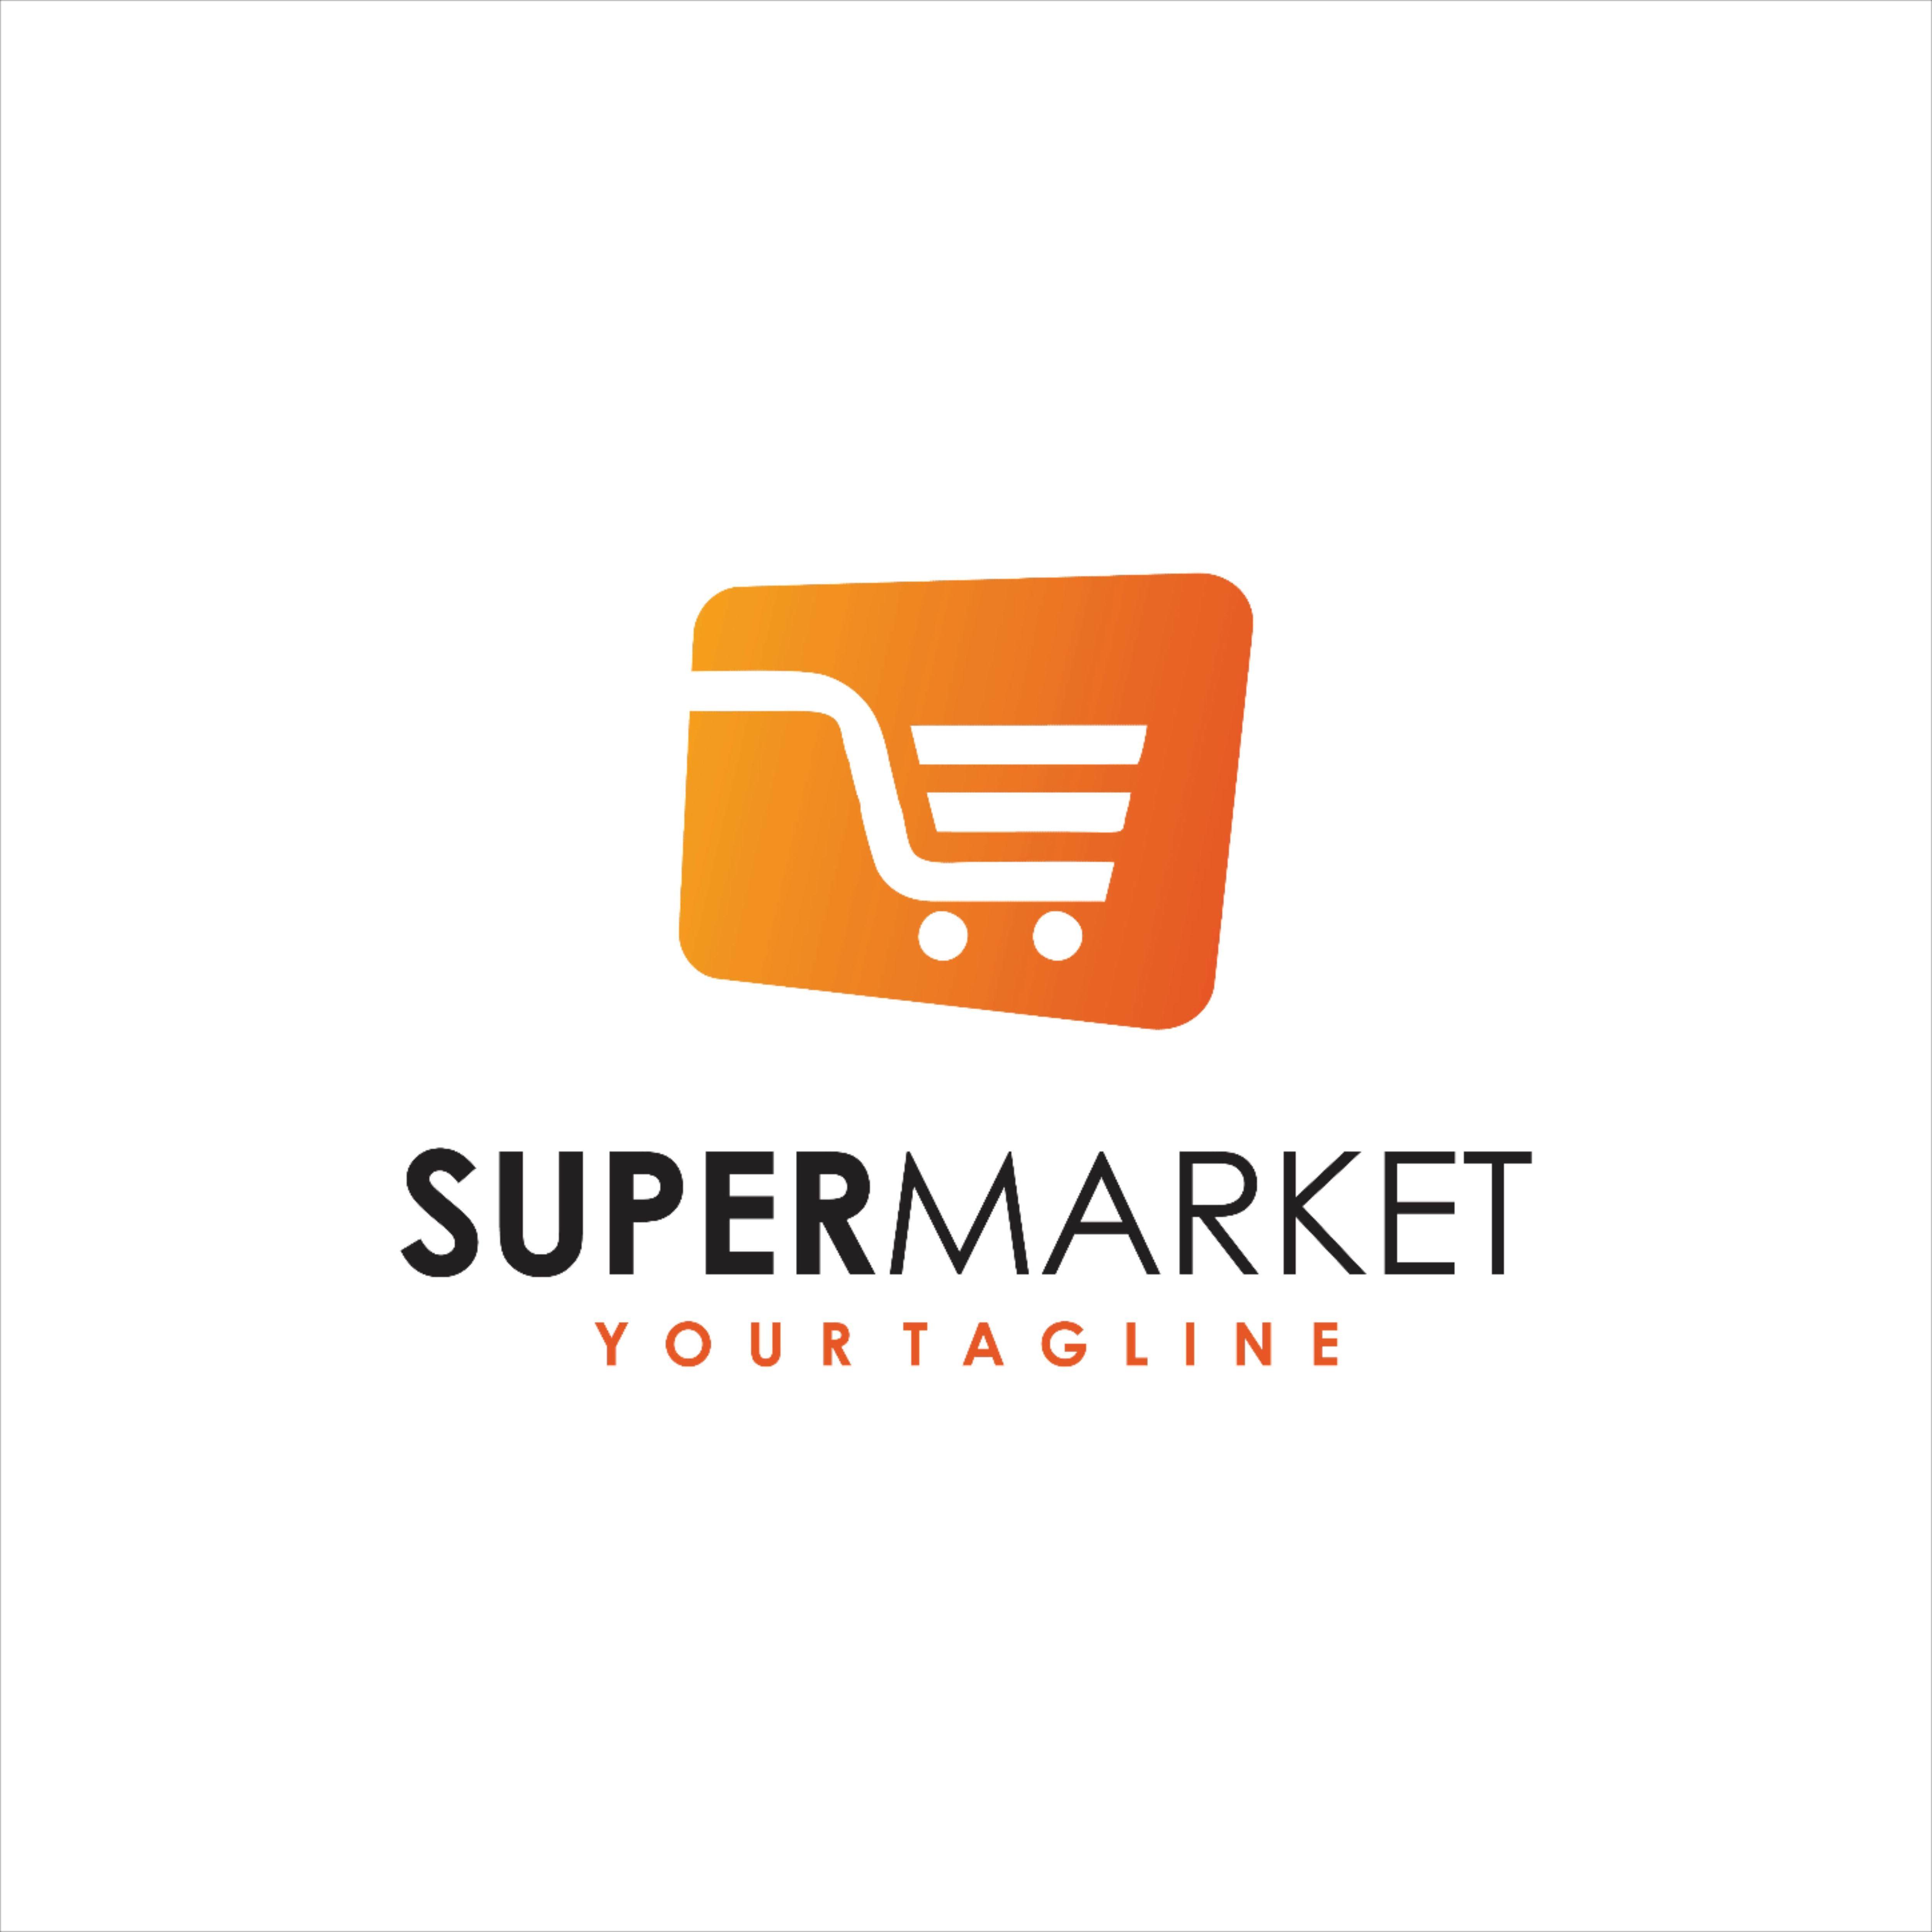 Super Market Logo And Market Check In 2020 Minimalist Logo Logos Stock Images Free